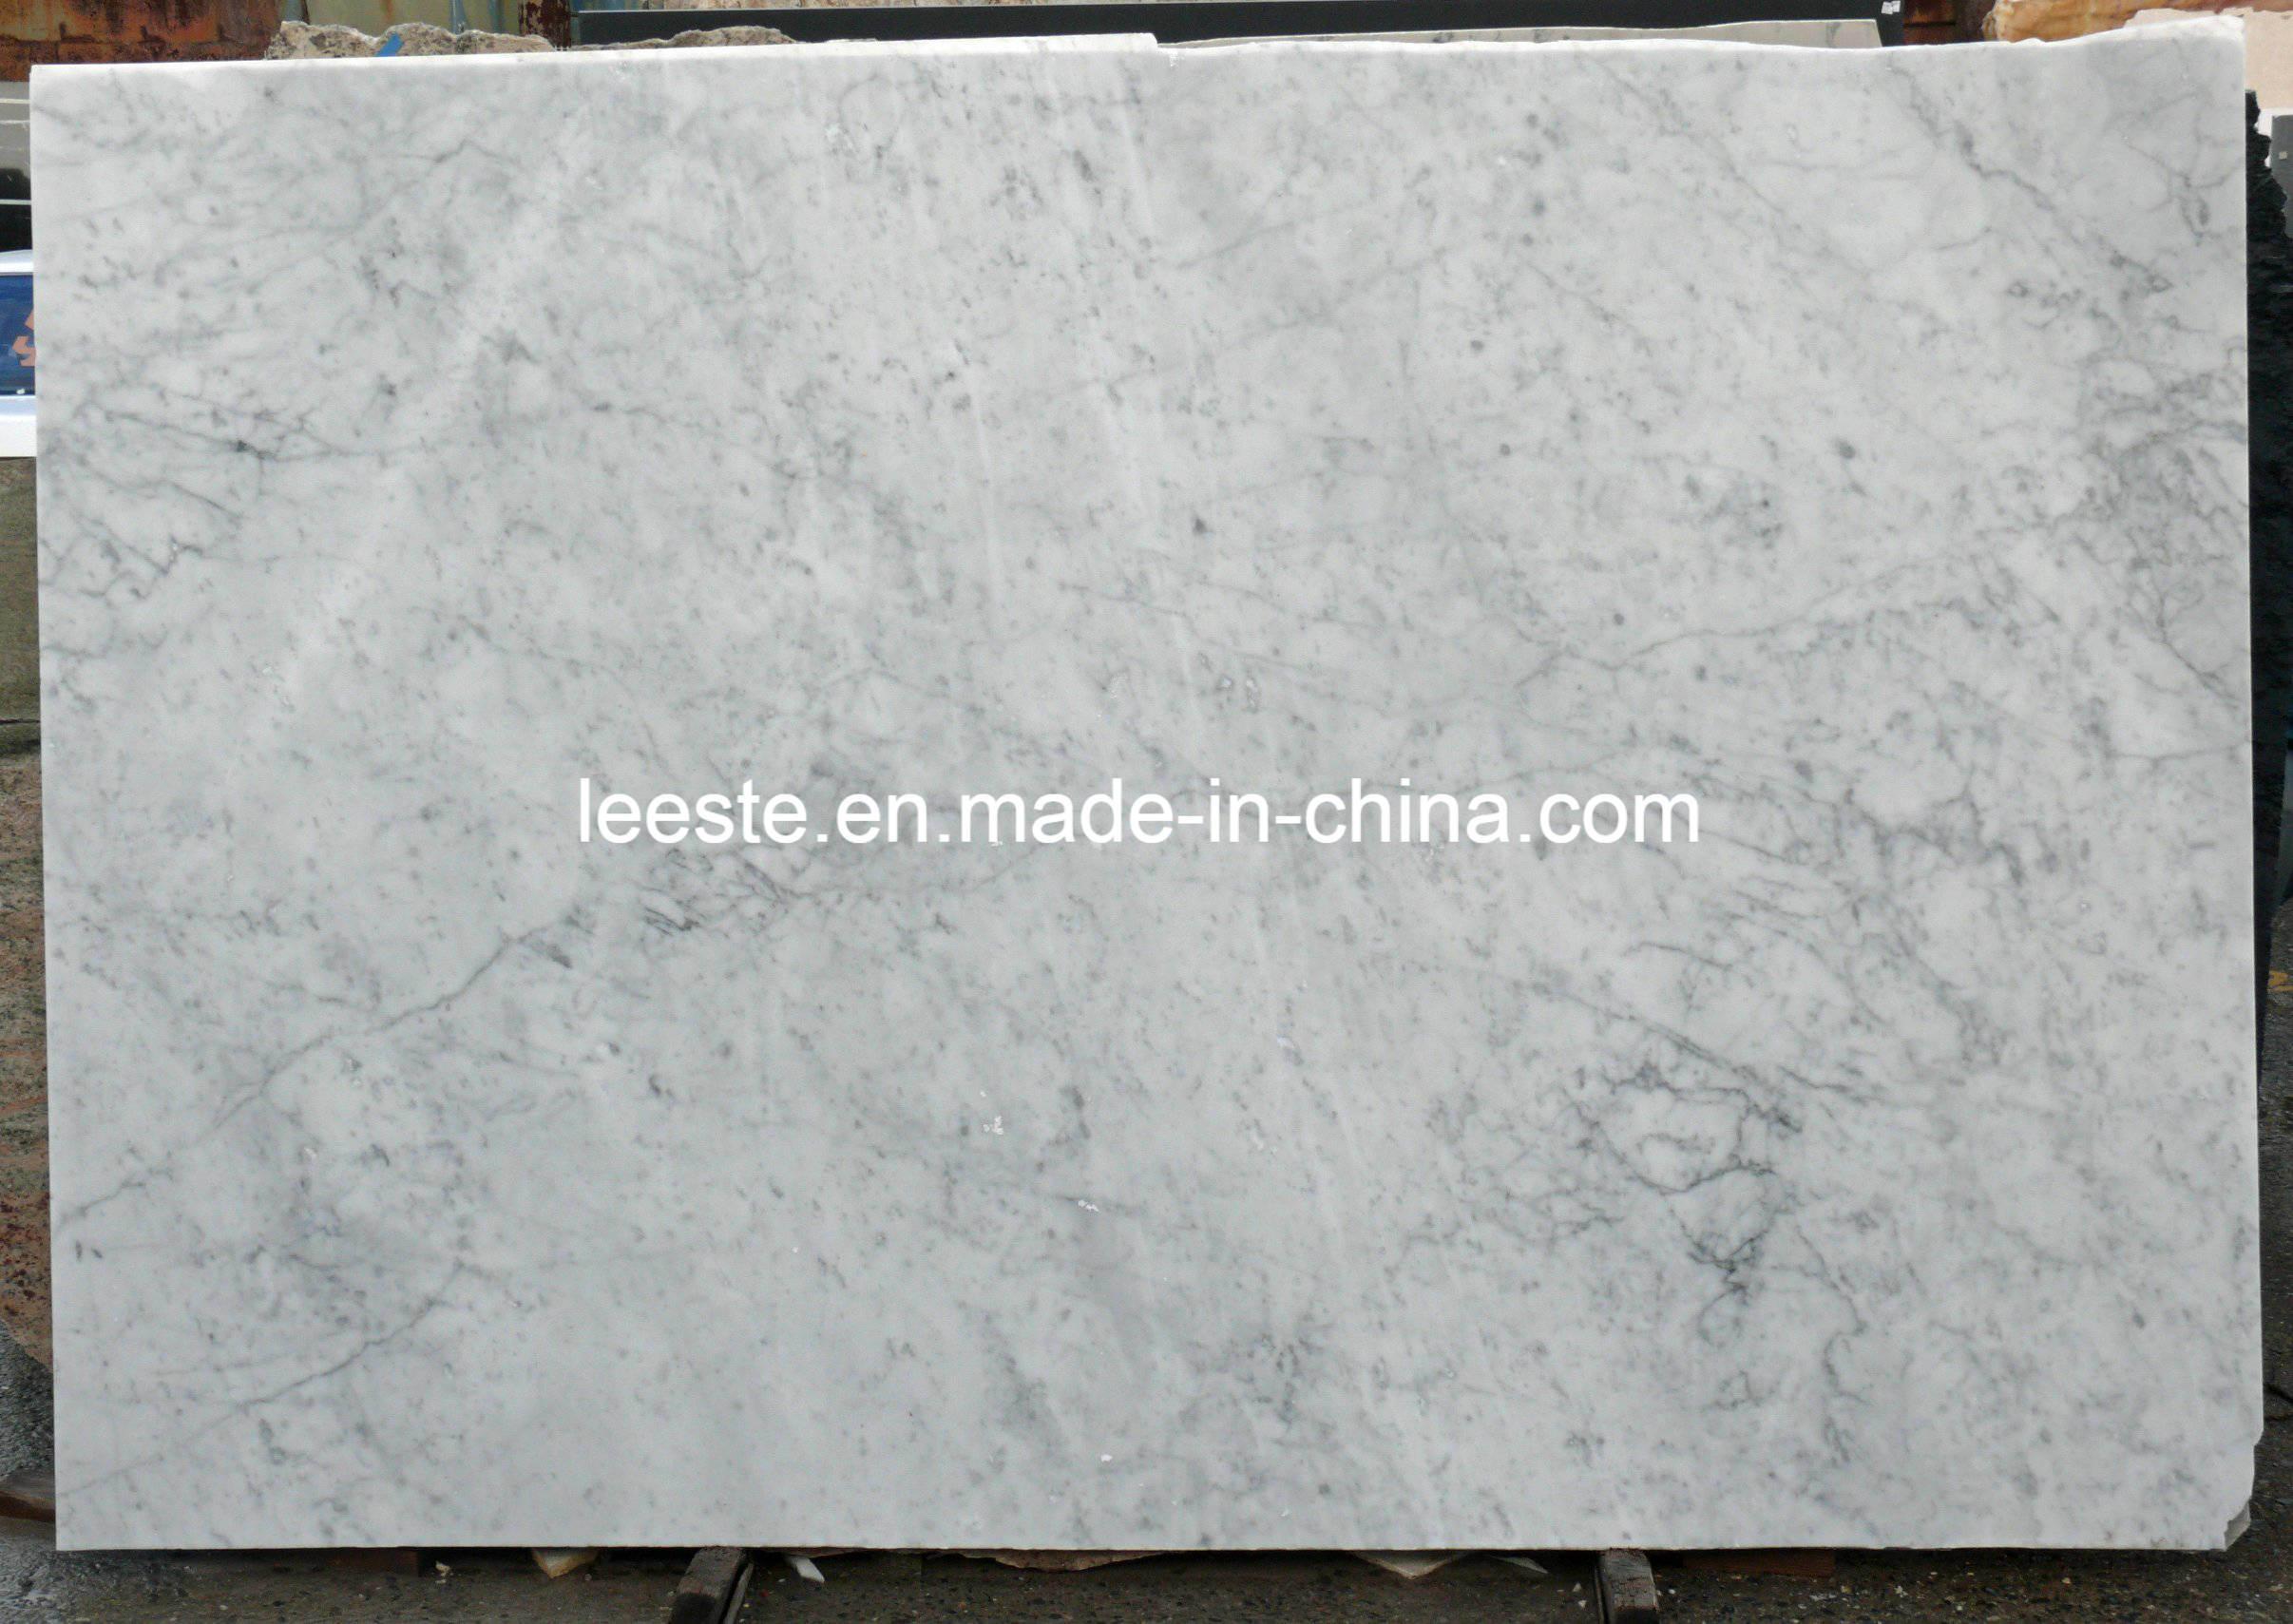 carrara cost kitchen countertop and granite honed pin raleigh remodel marble full in north countertops pearl black finish carolina leather